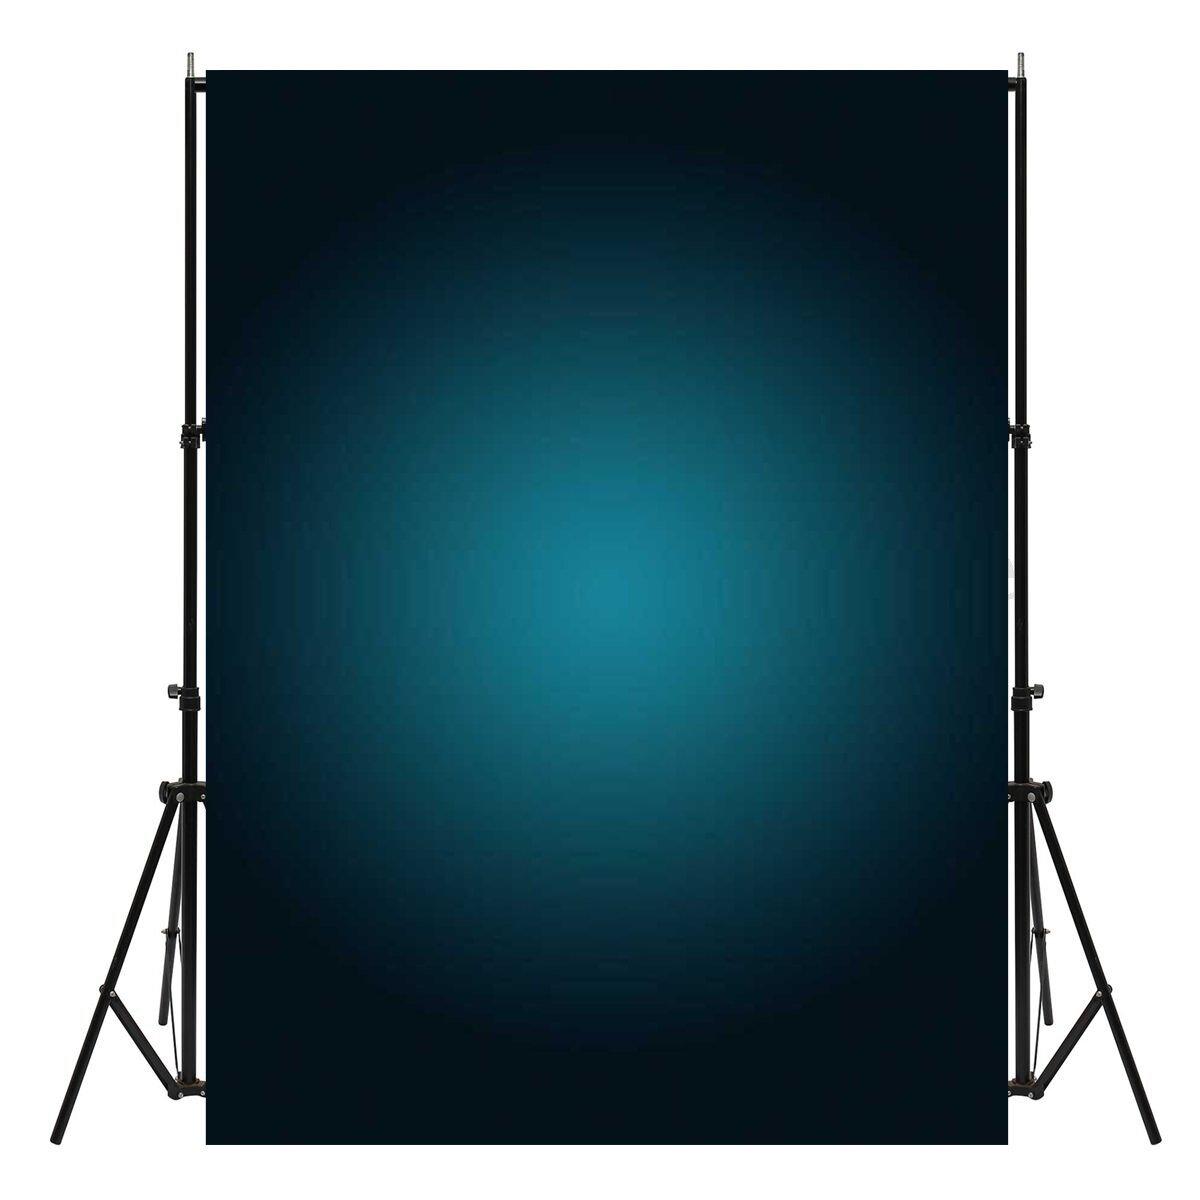 Gradient Pure Dark Blue Photography Backgrounds 5x6.5ft Vinyl Photo Backdrops Bright Color Rich Patterns napapijri guji check dark blue